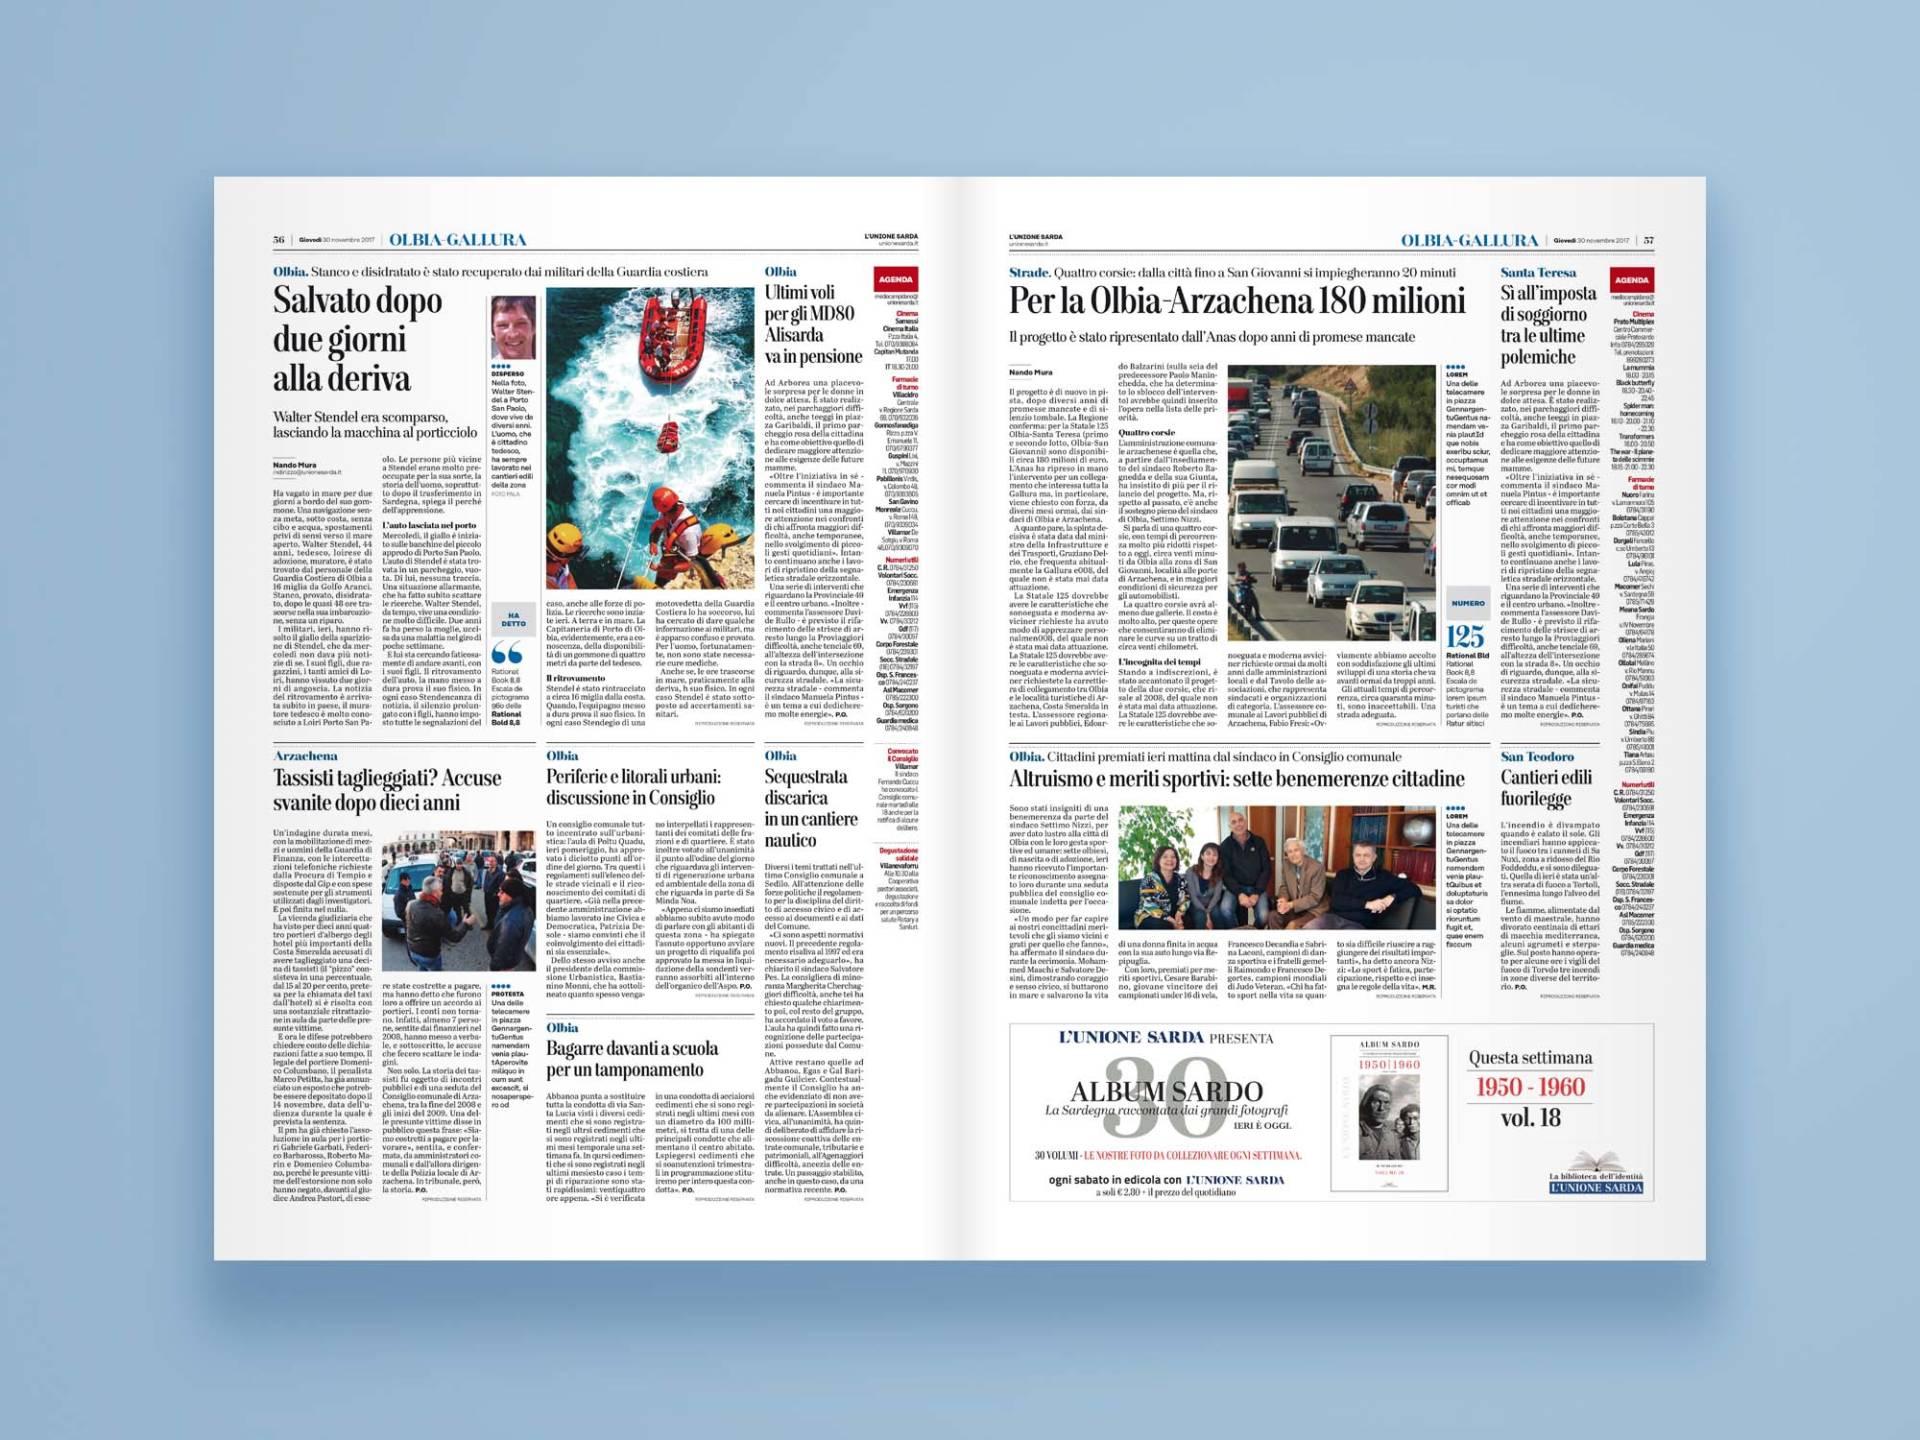 L'Unione_Sarda_06_Wenceslau_News_Design